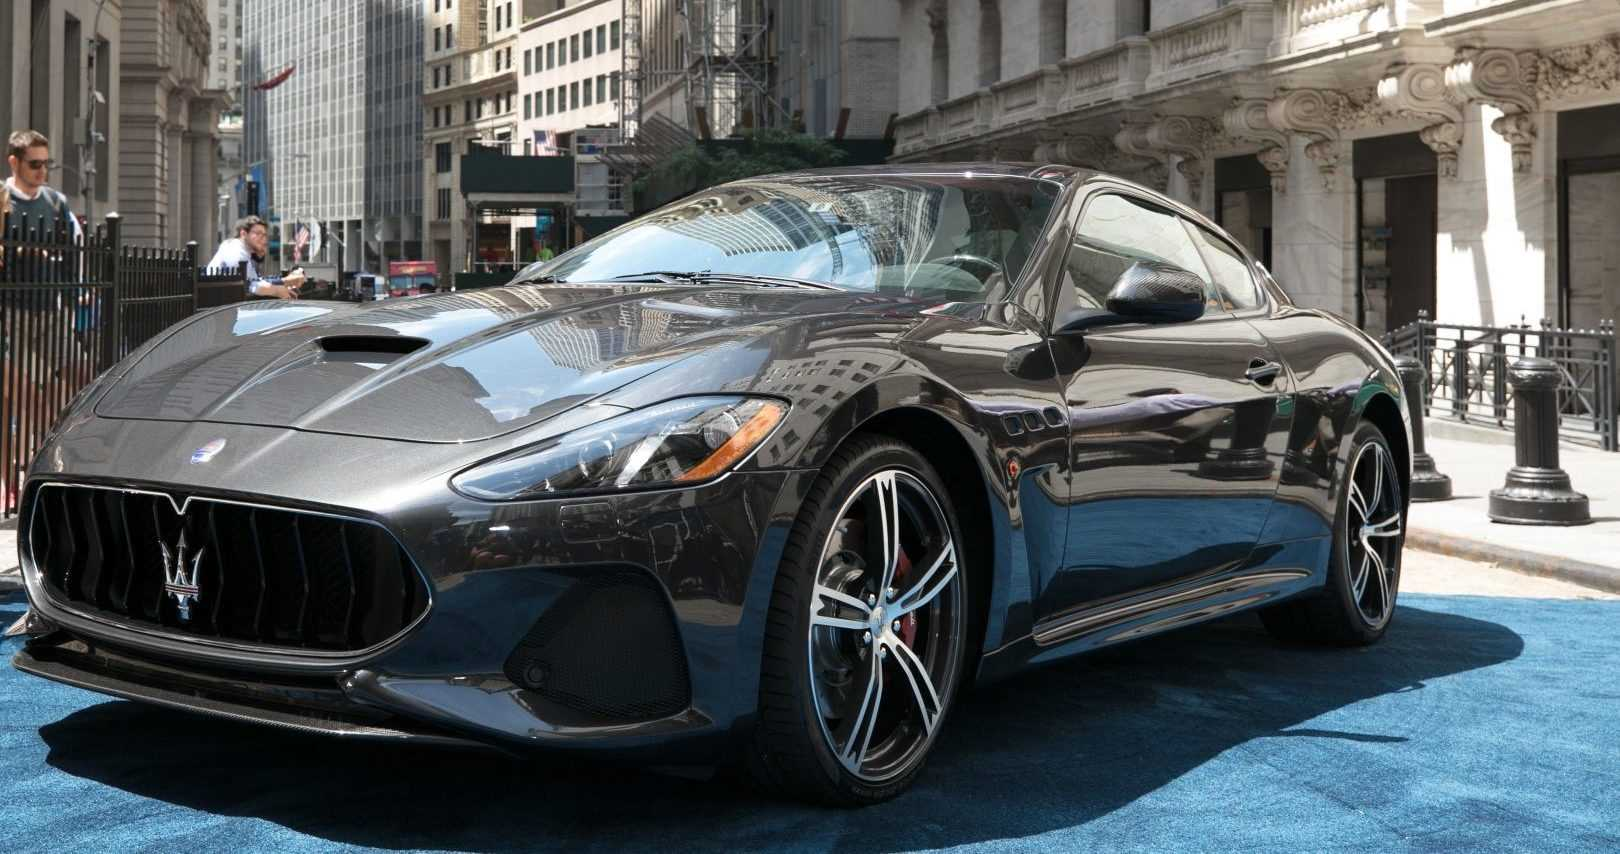 Maserati GranTurismo modeljaar 2018